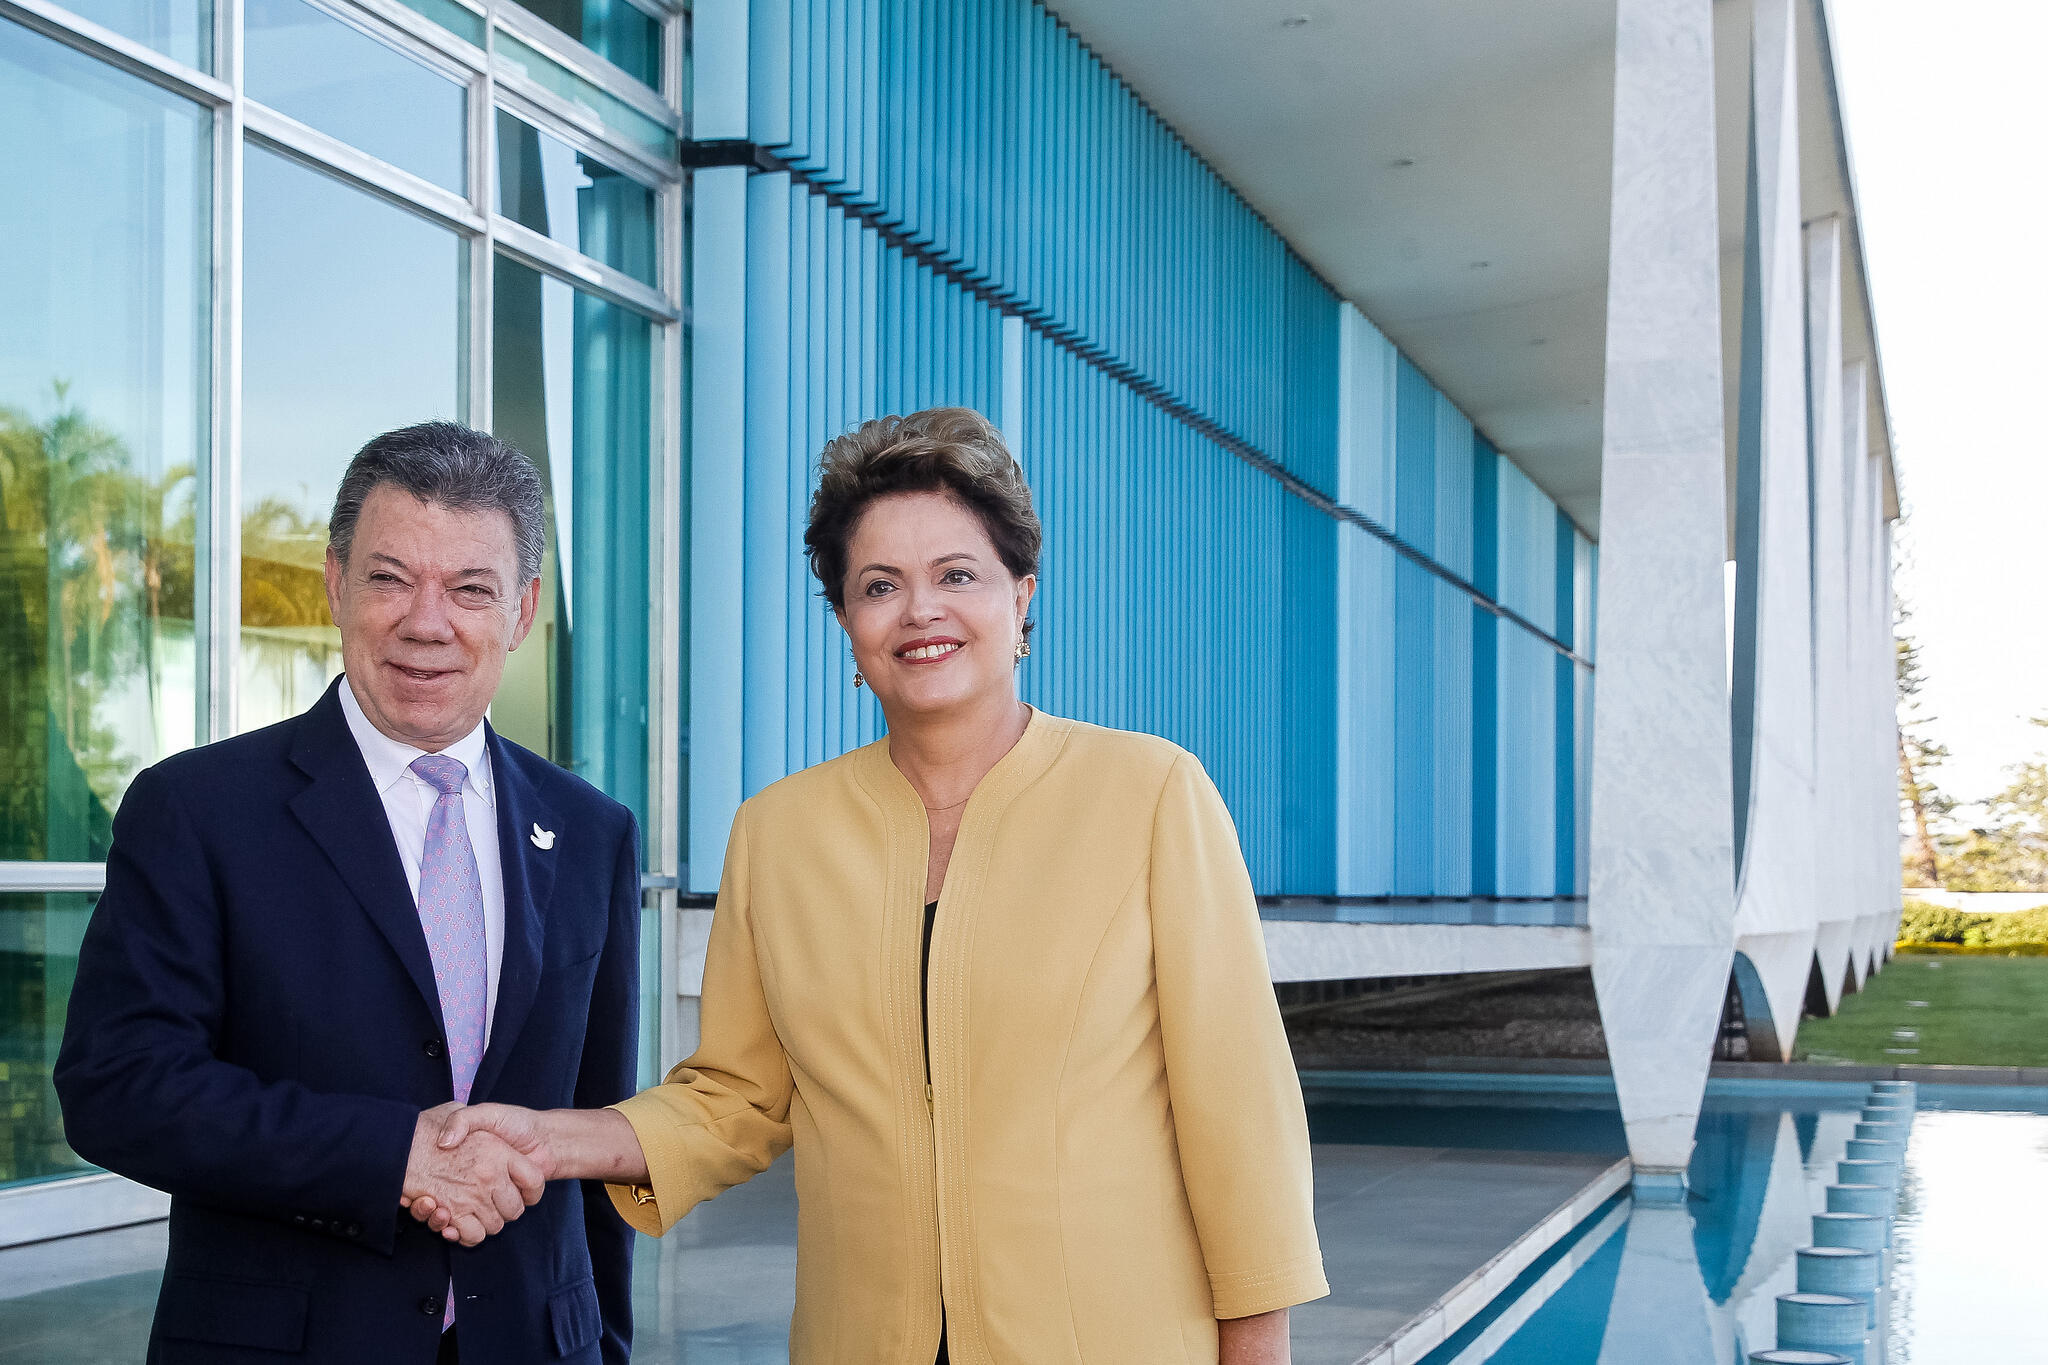 A presidente Dilma Rousseff e o presidente da Colômbia, Juan Manuel Santos, em Brasília. 9/06/2014.